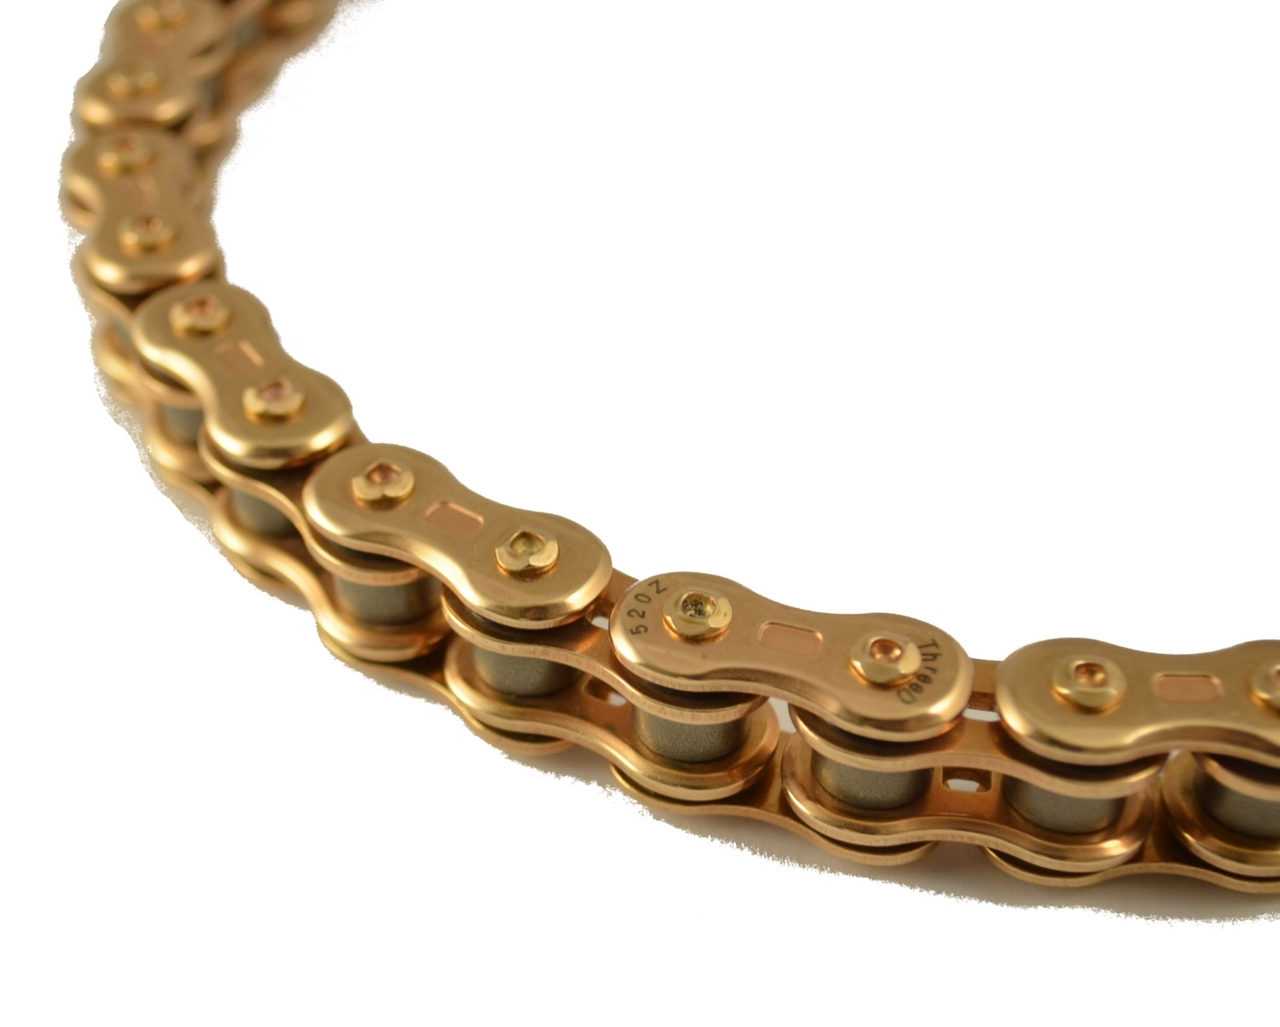 3D 鏈條 520Z(GP/GP) 金色